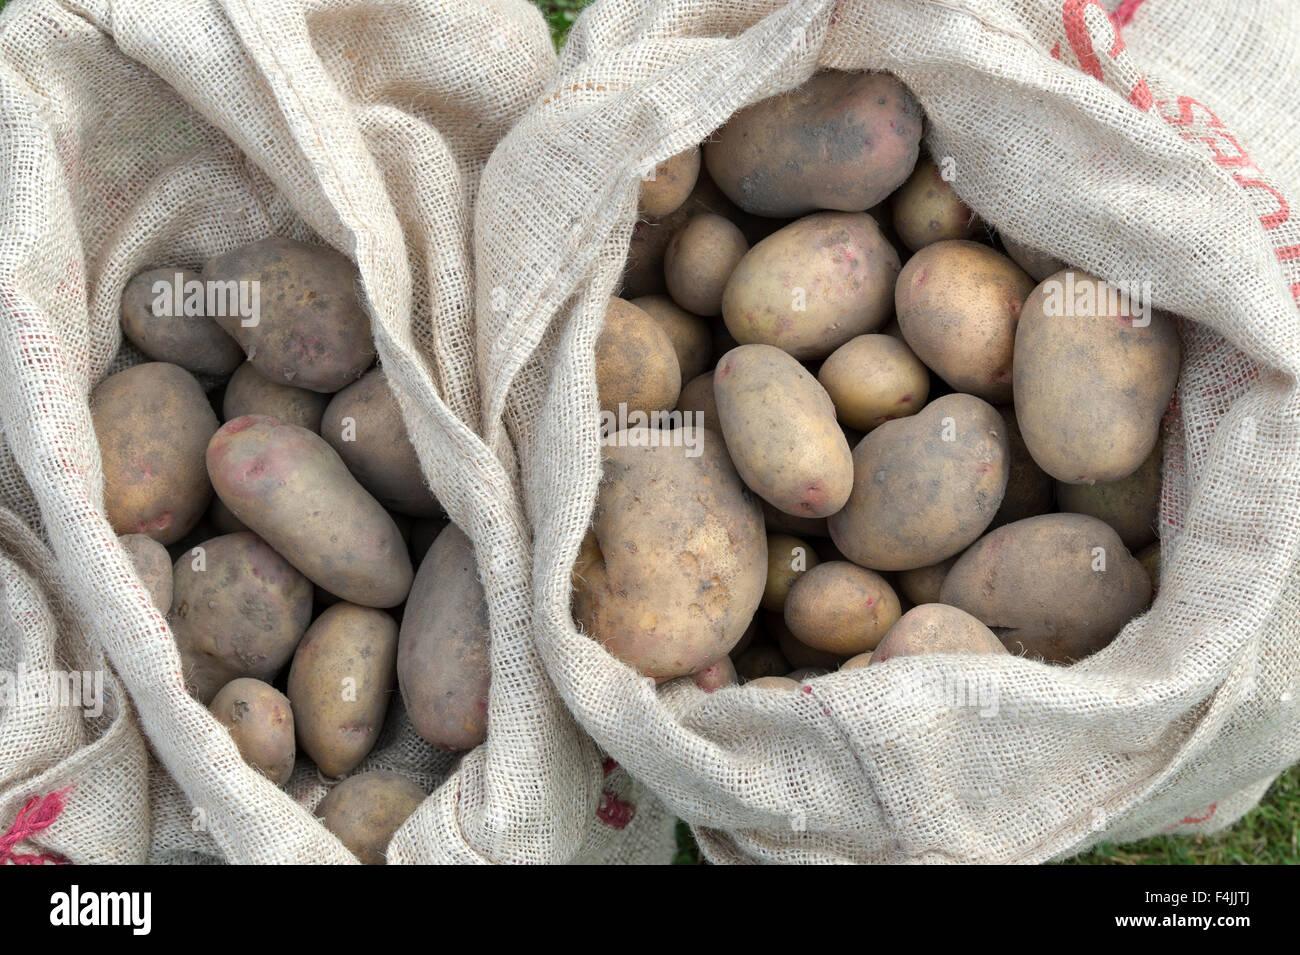 Harvested potatoes in hessian sacks - Stock Image